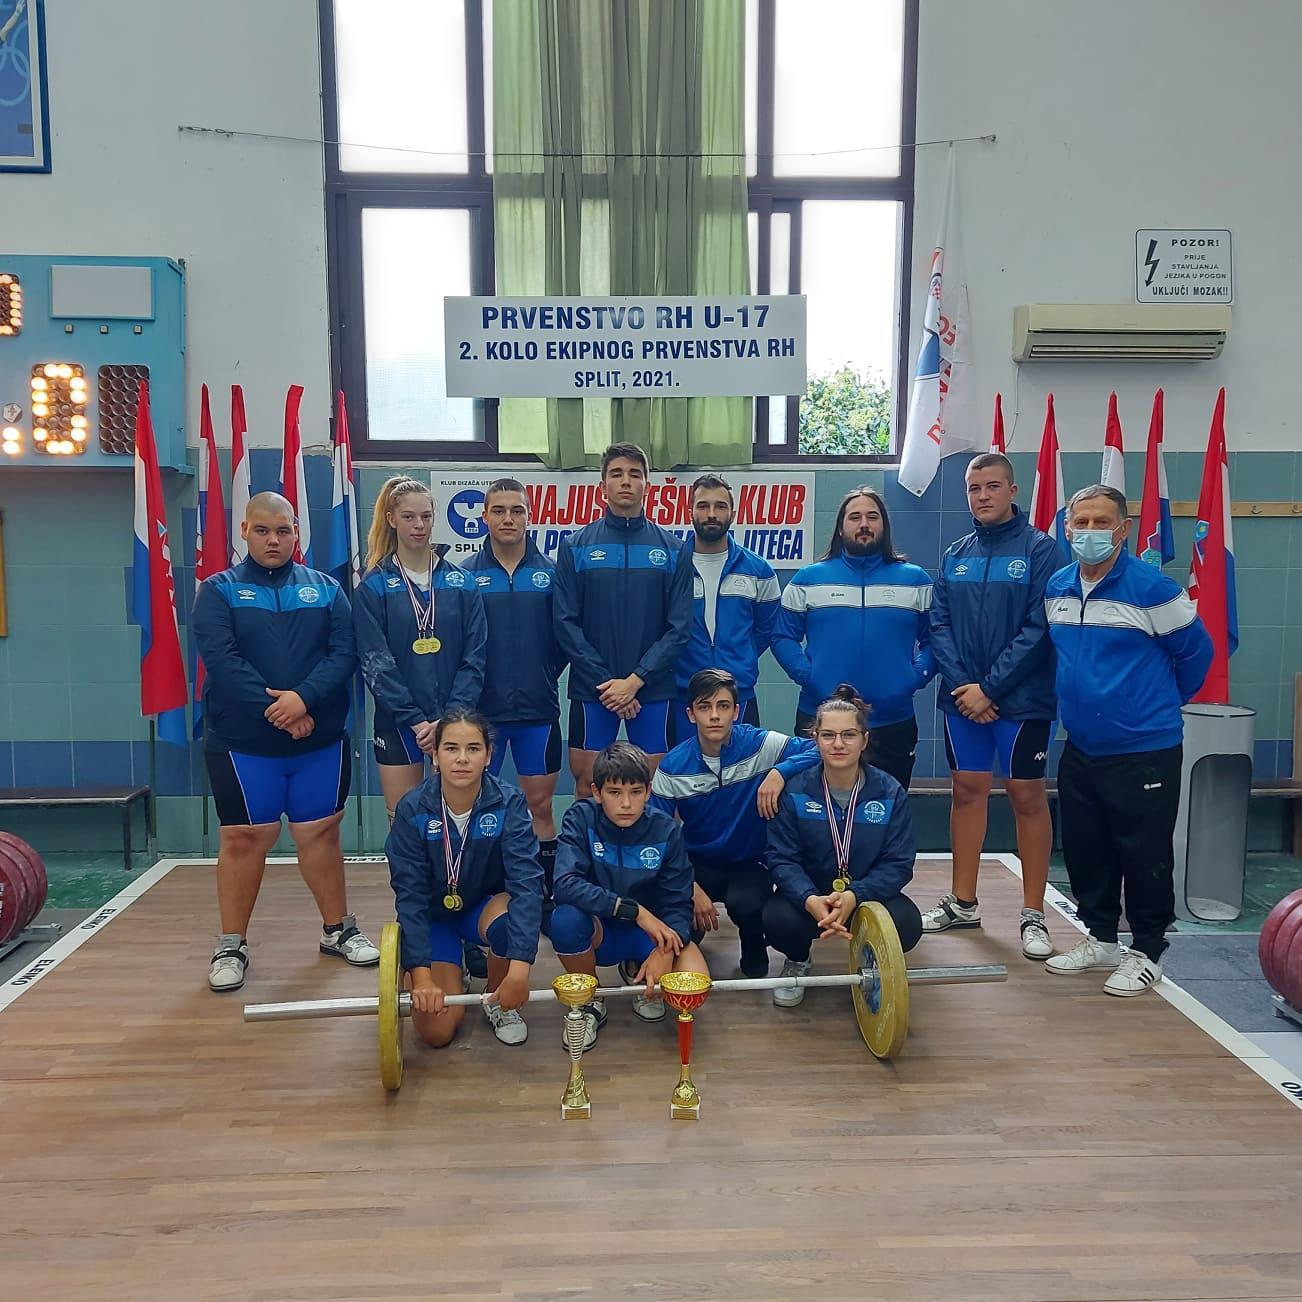 Sportska Hrvatska 24 ZLATA 3 BRONCE I 4 PEHARA i 5 REKORDA ZA VUKOVARCE